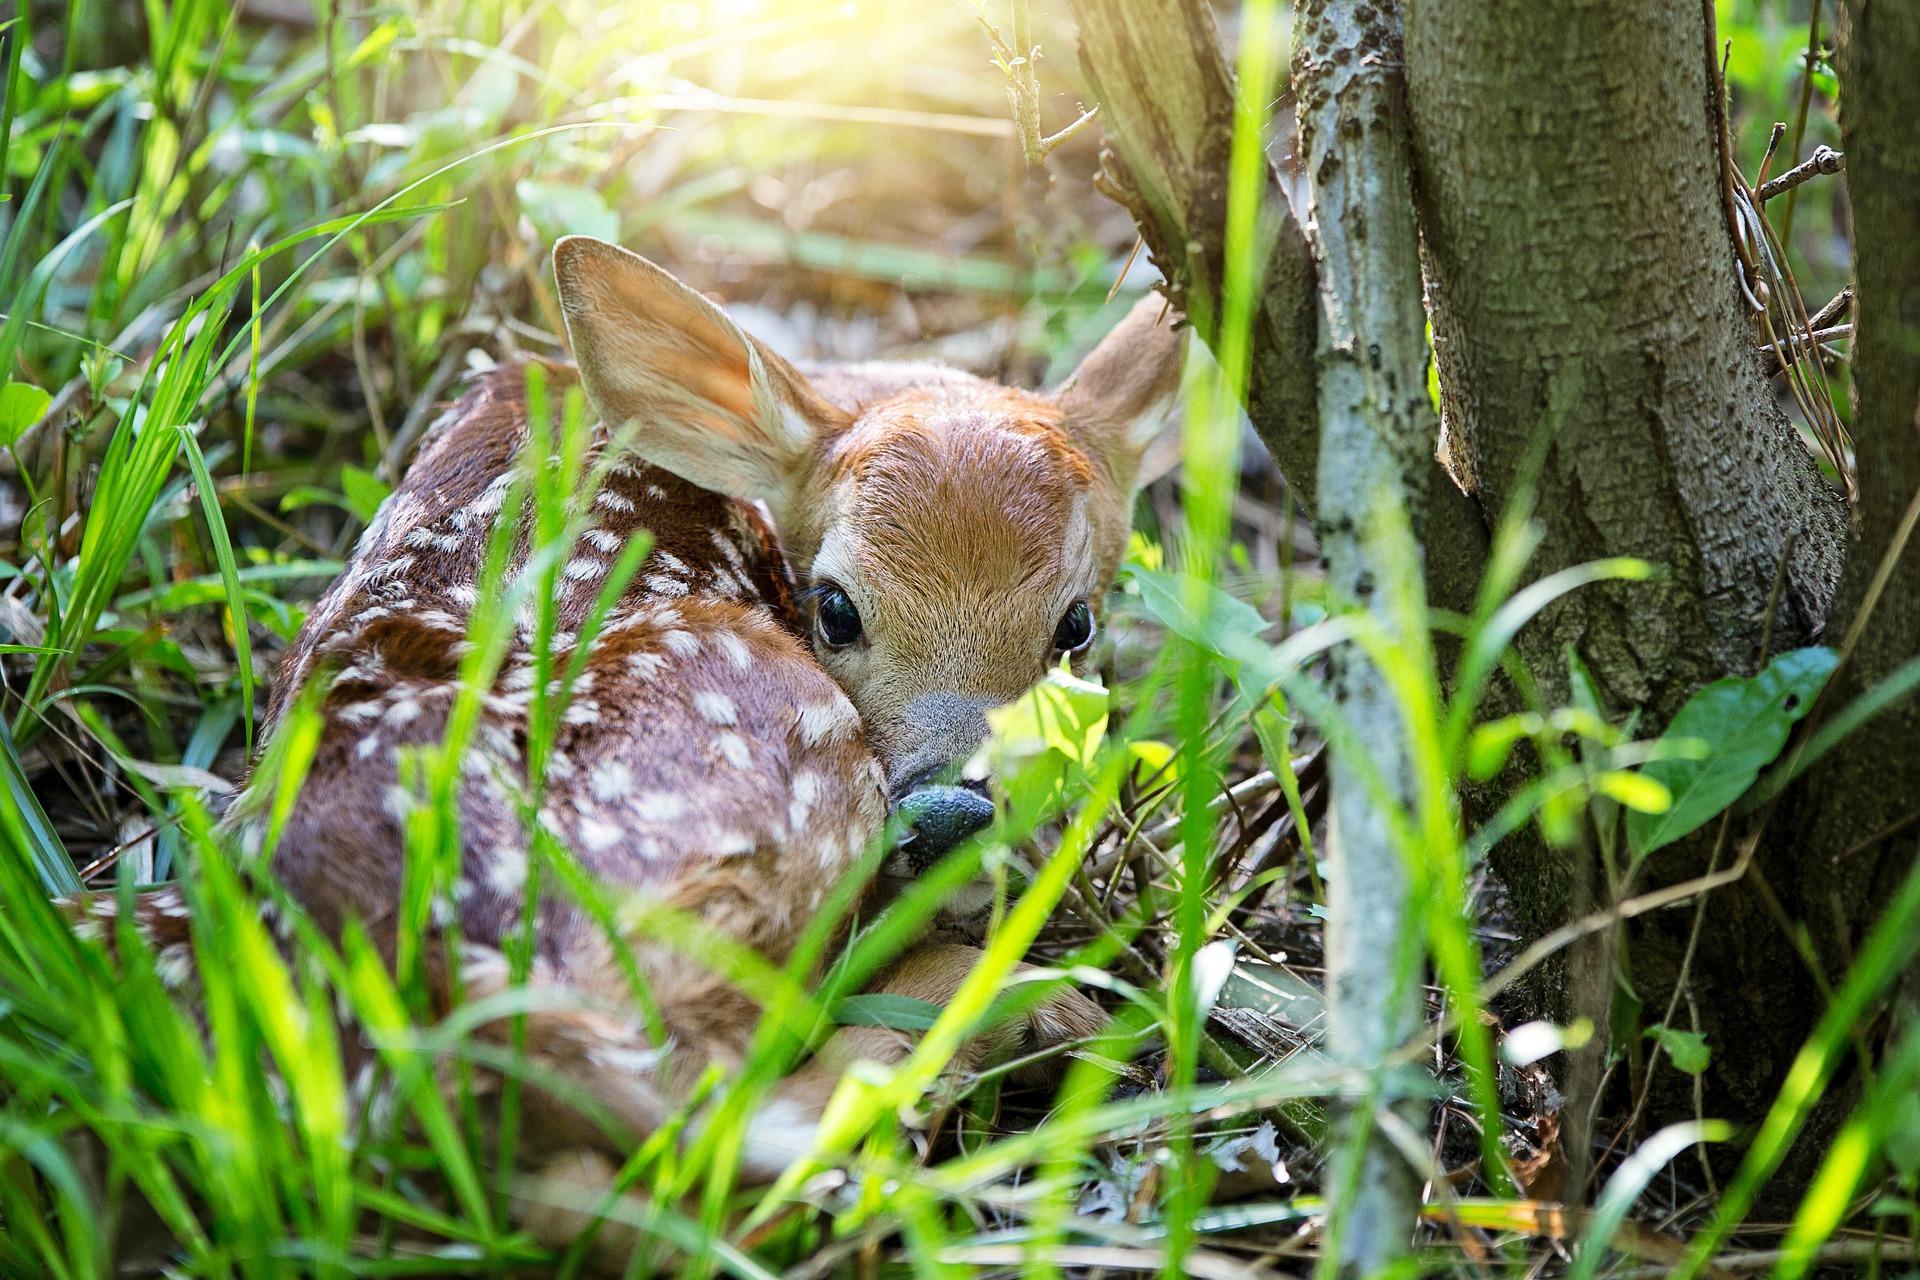 28 May - Newborns (I - Nettle nest)